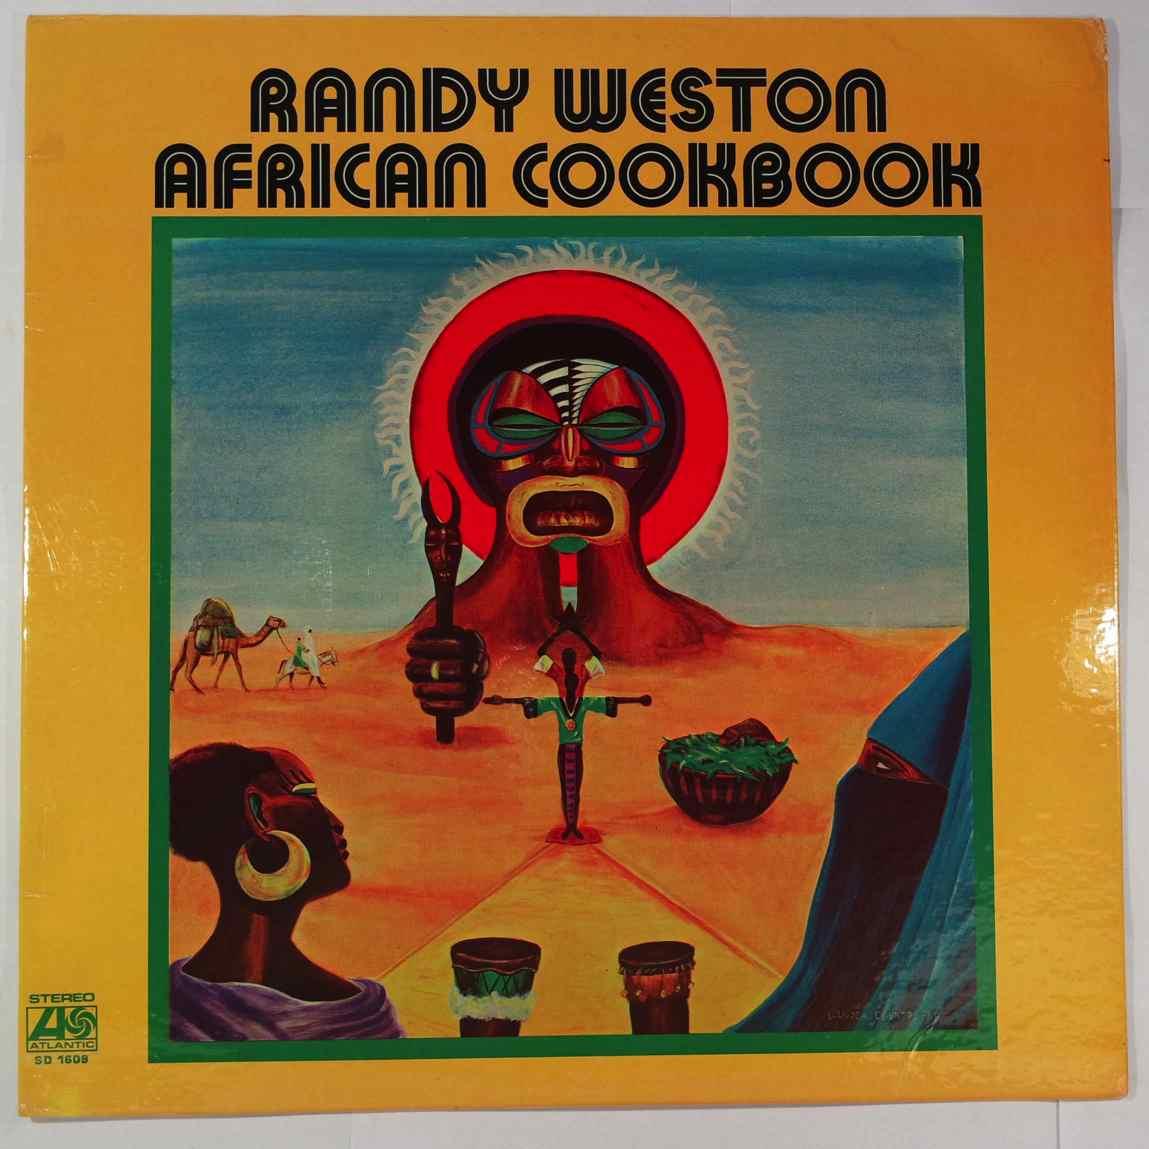 RANDY WESTON - African Cookbook - LP